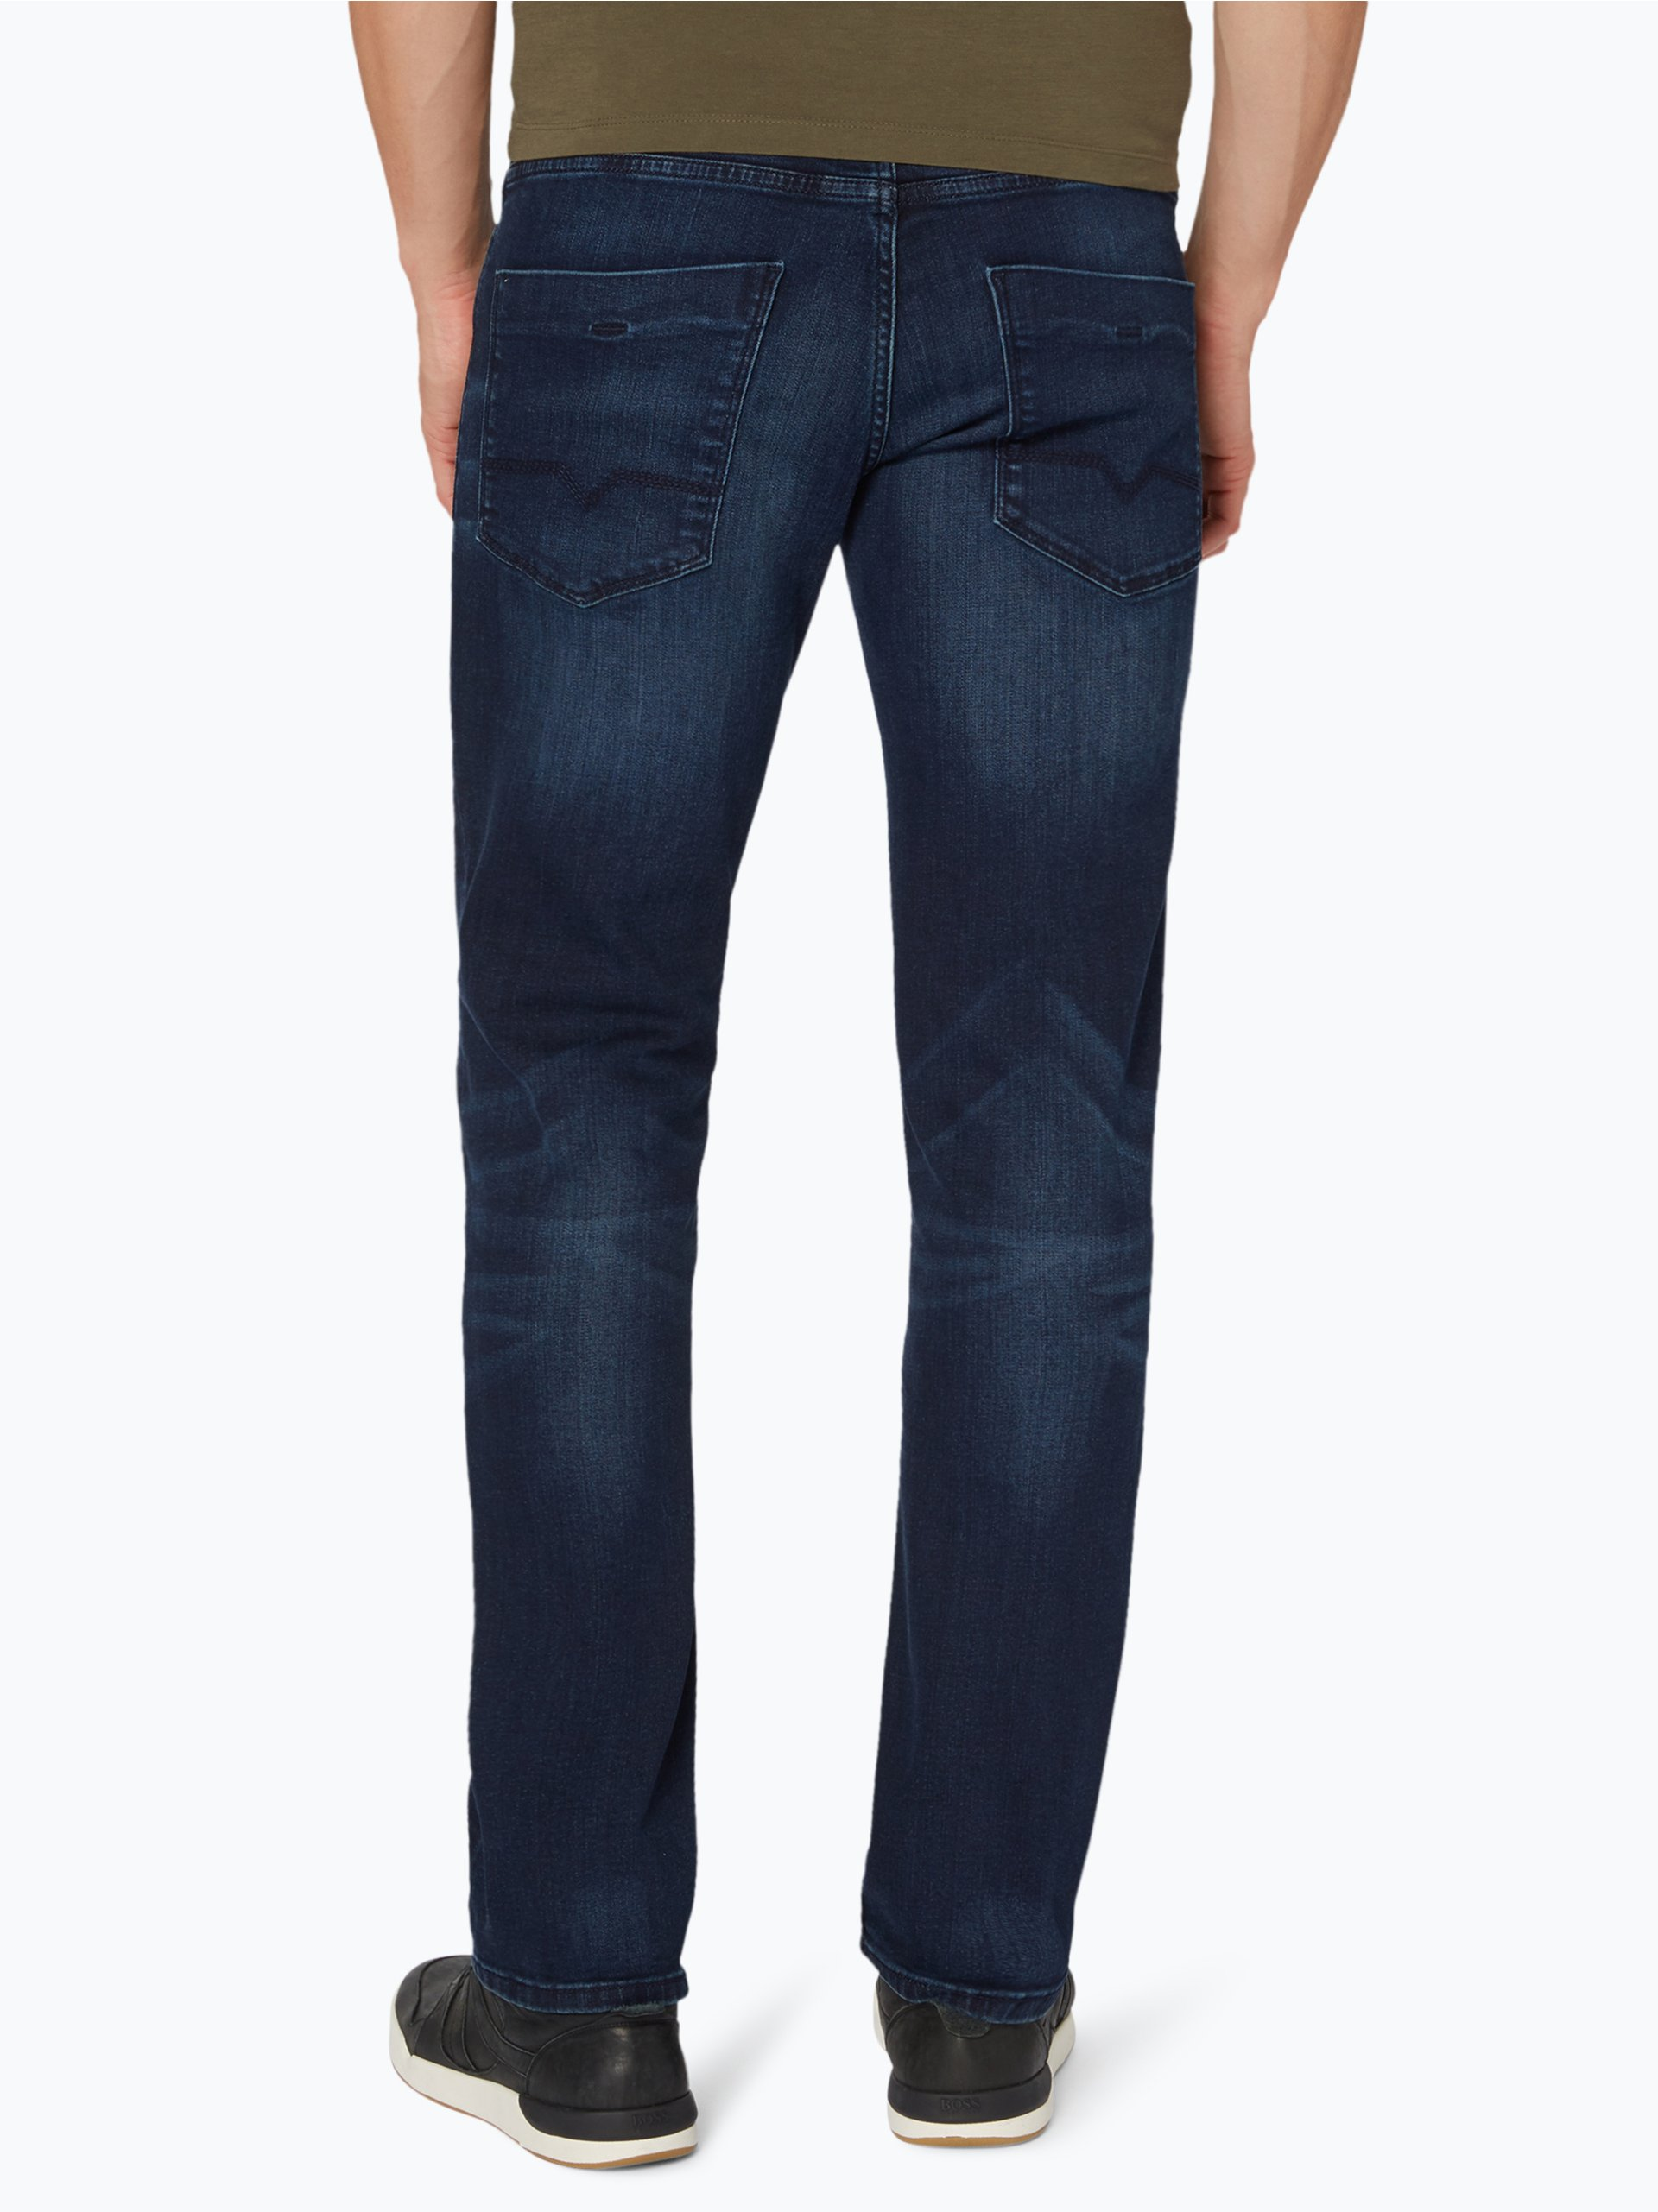 boss casual herren jeans orange 63 online kaufen vangraaf com. Black Bedroom Furniture Sets. Home Design Ideas